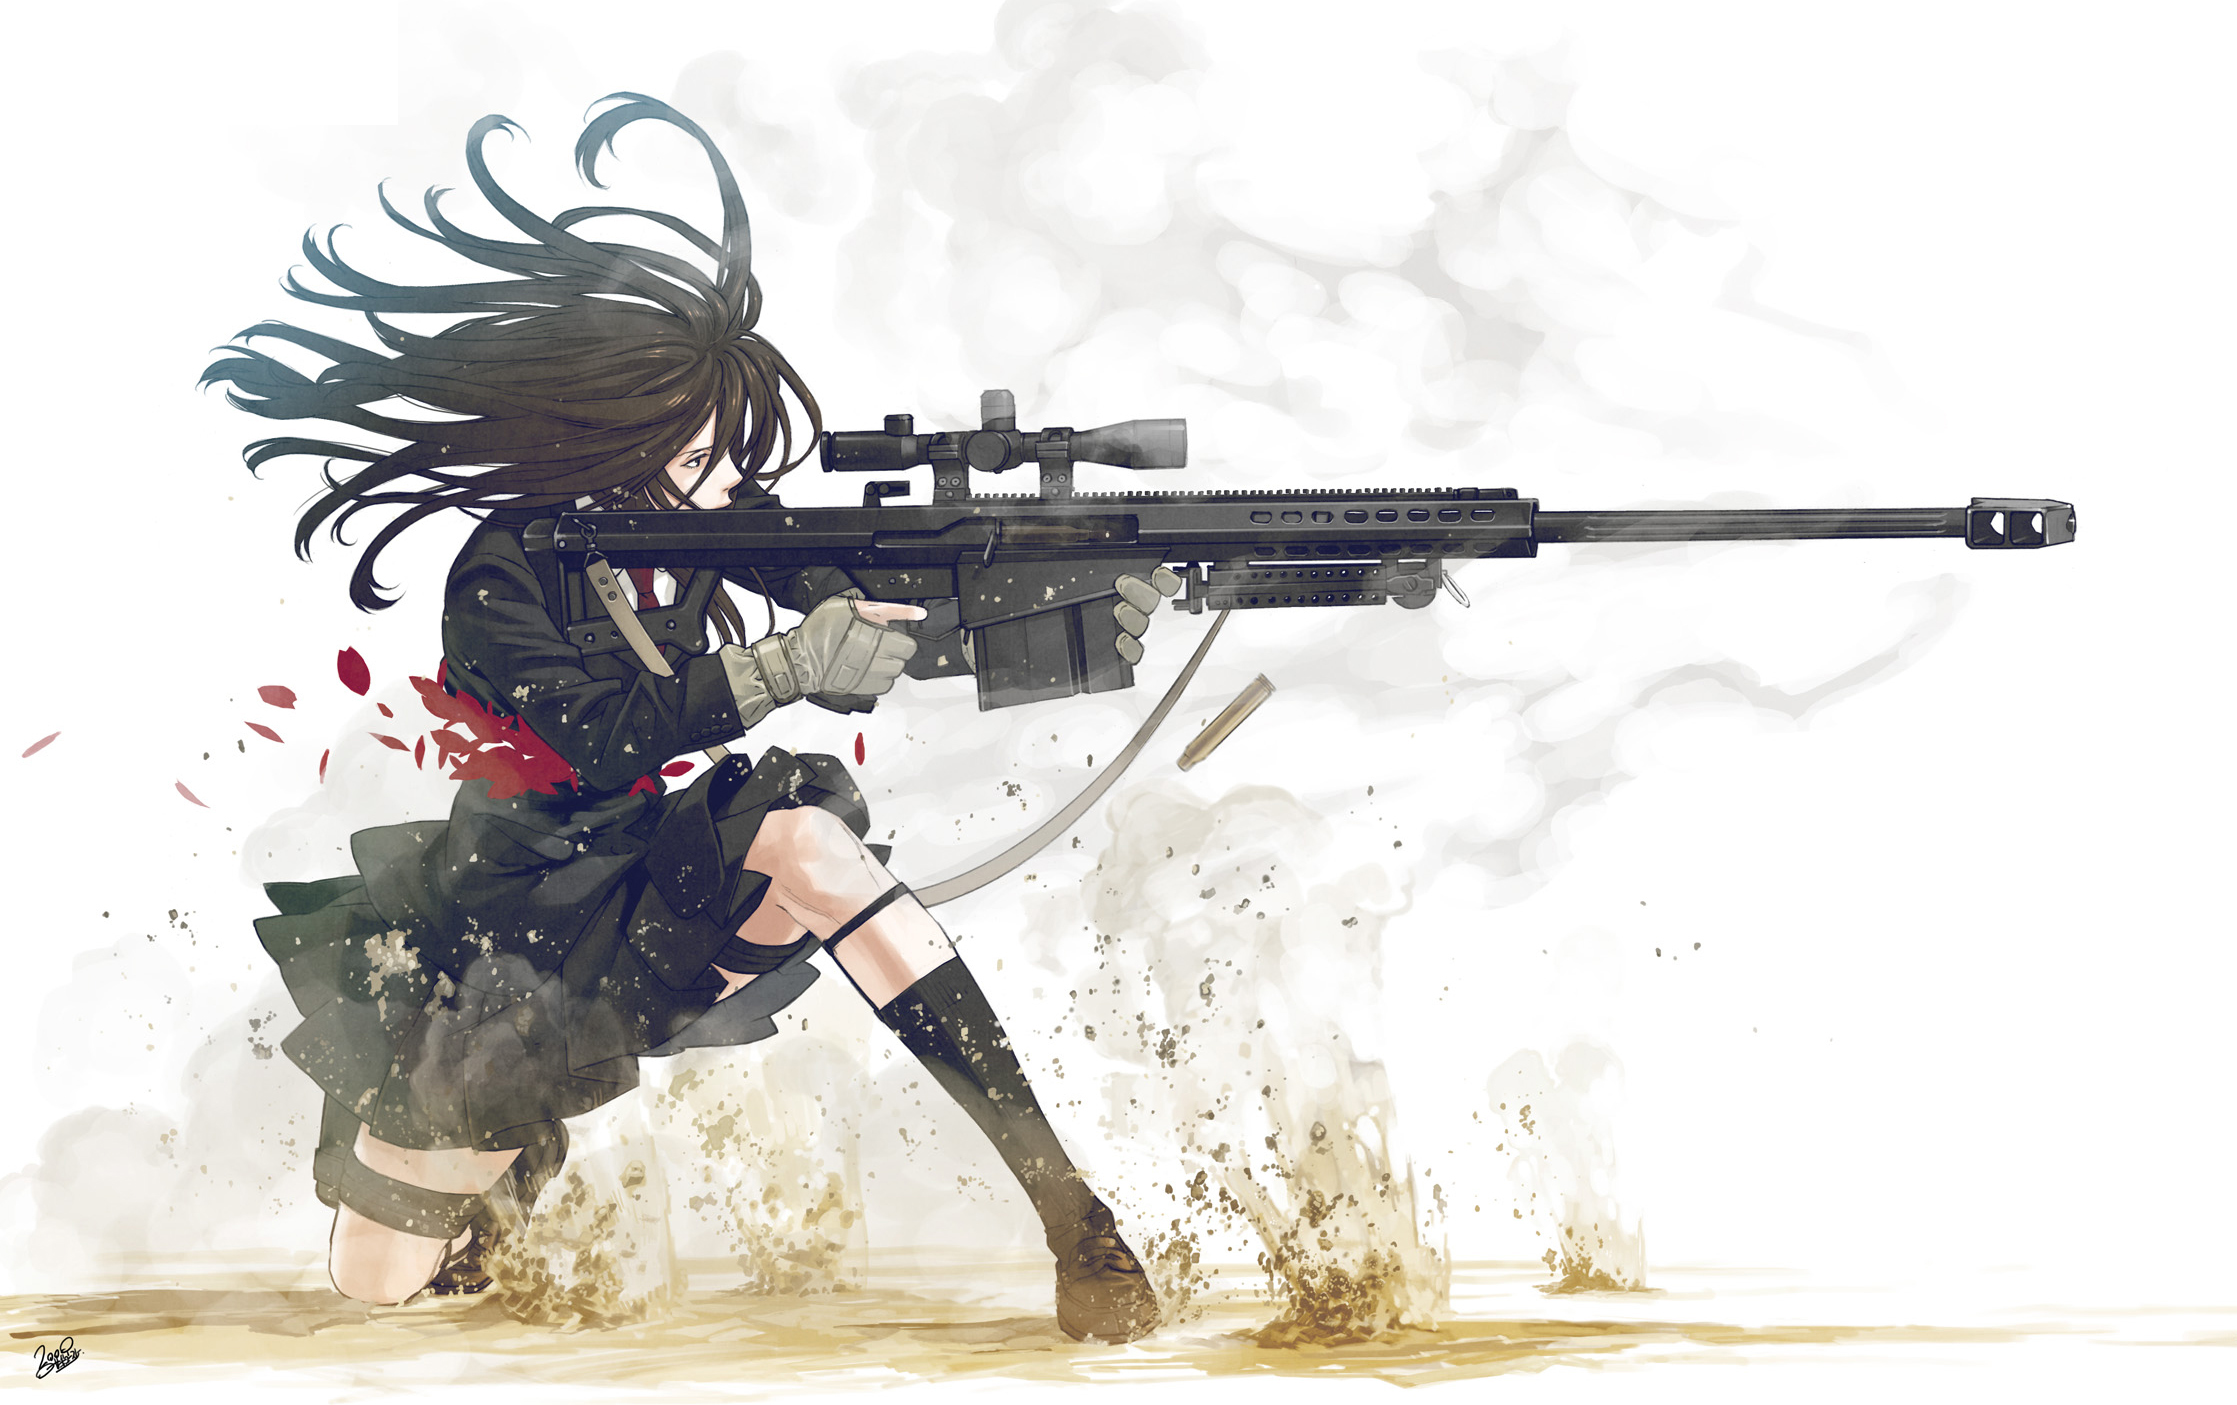 Pin By Rafaela Morais On Desenhos Animes E Mangas Anime Characters Male Sniper Anime